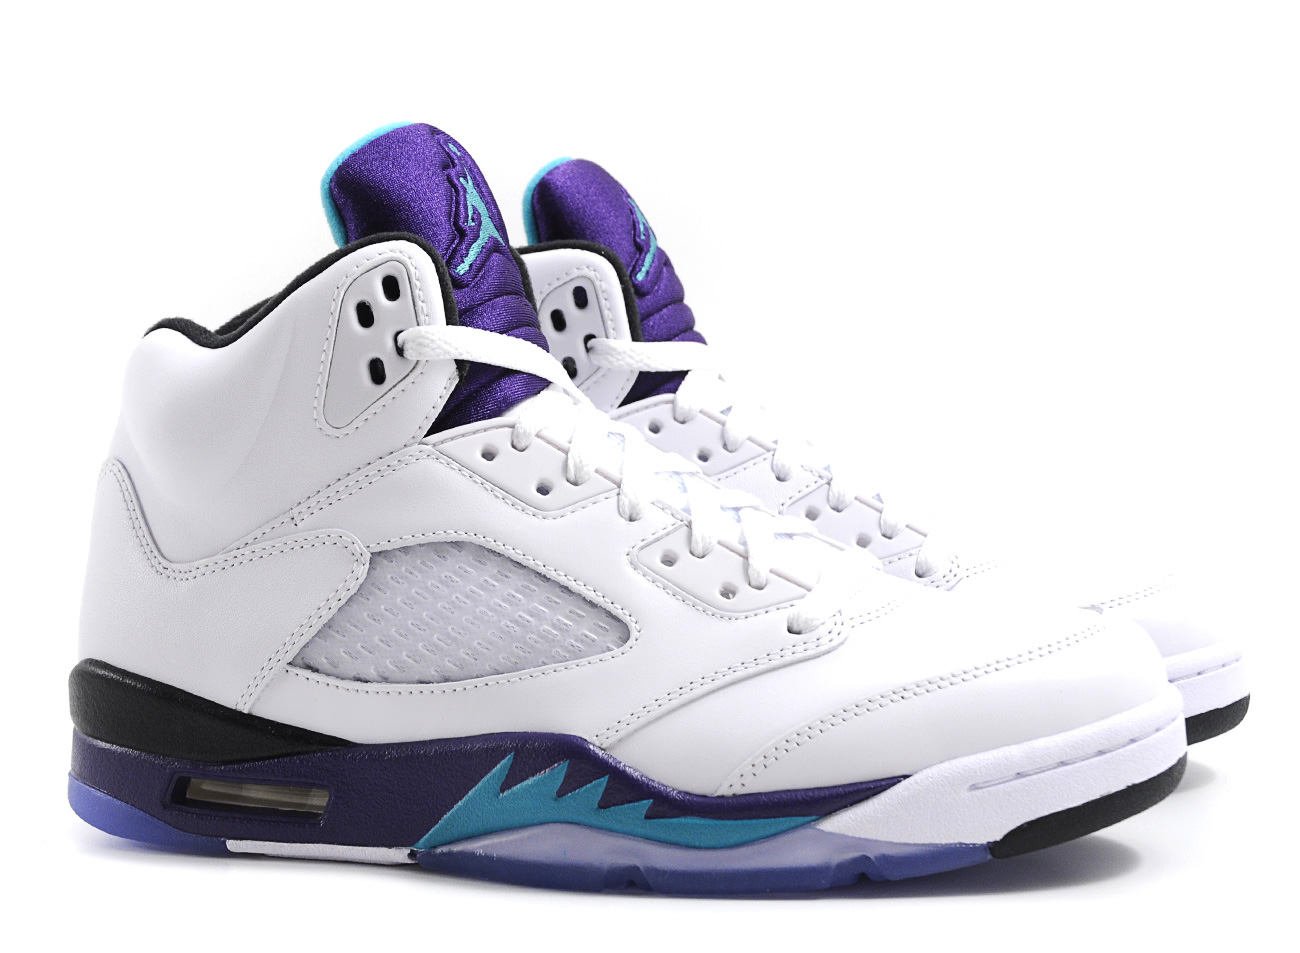 Nike Air Jordan 5 Grape White / New Emerald Grape Ice Blue ...